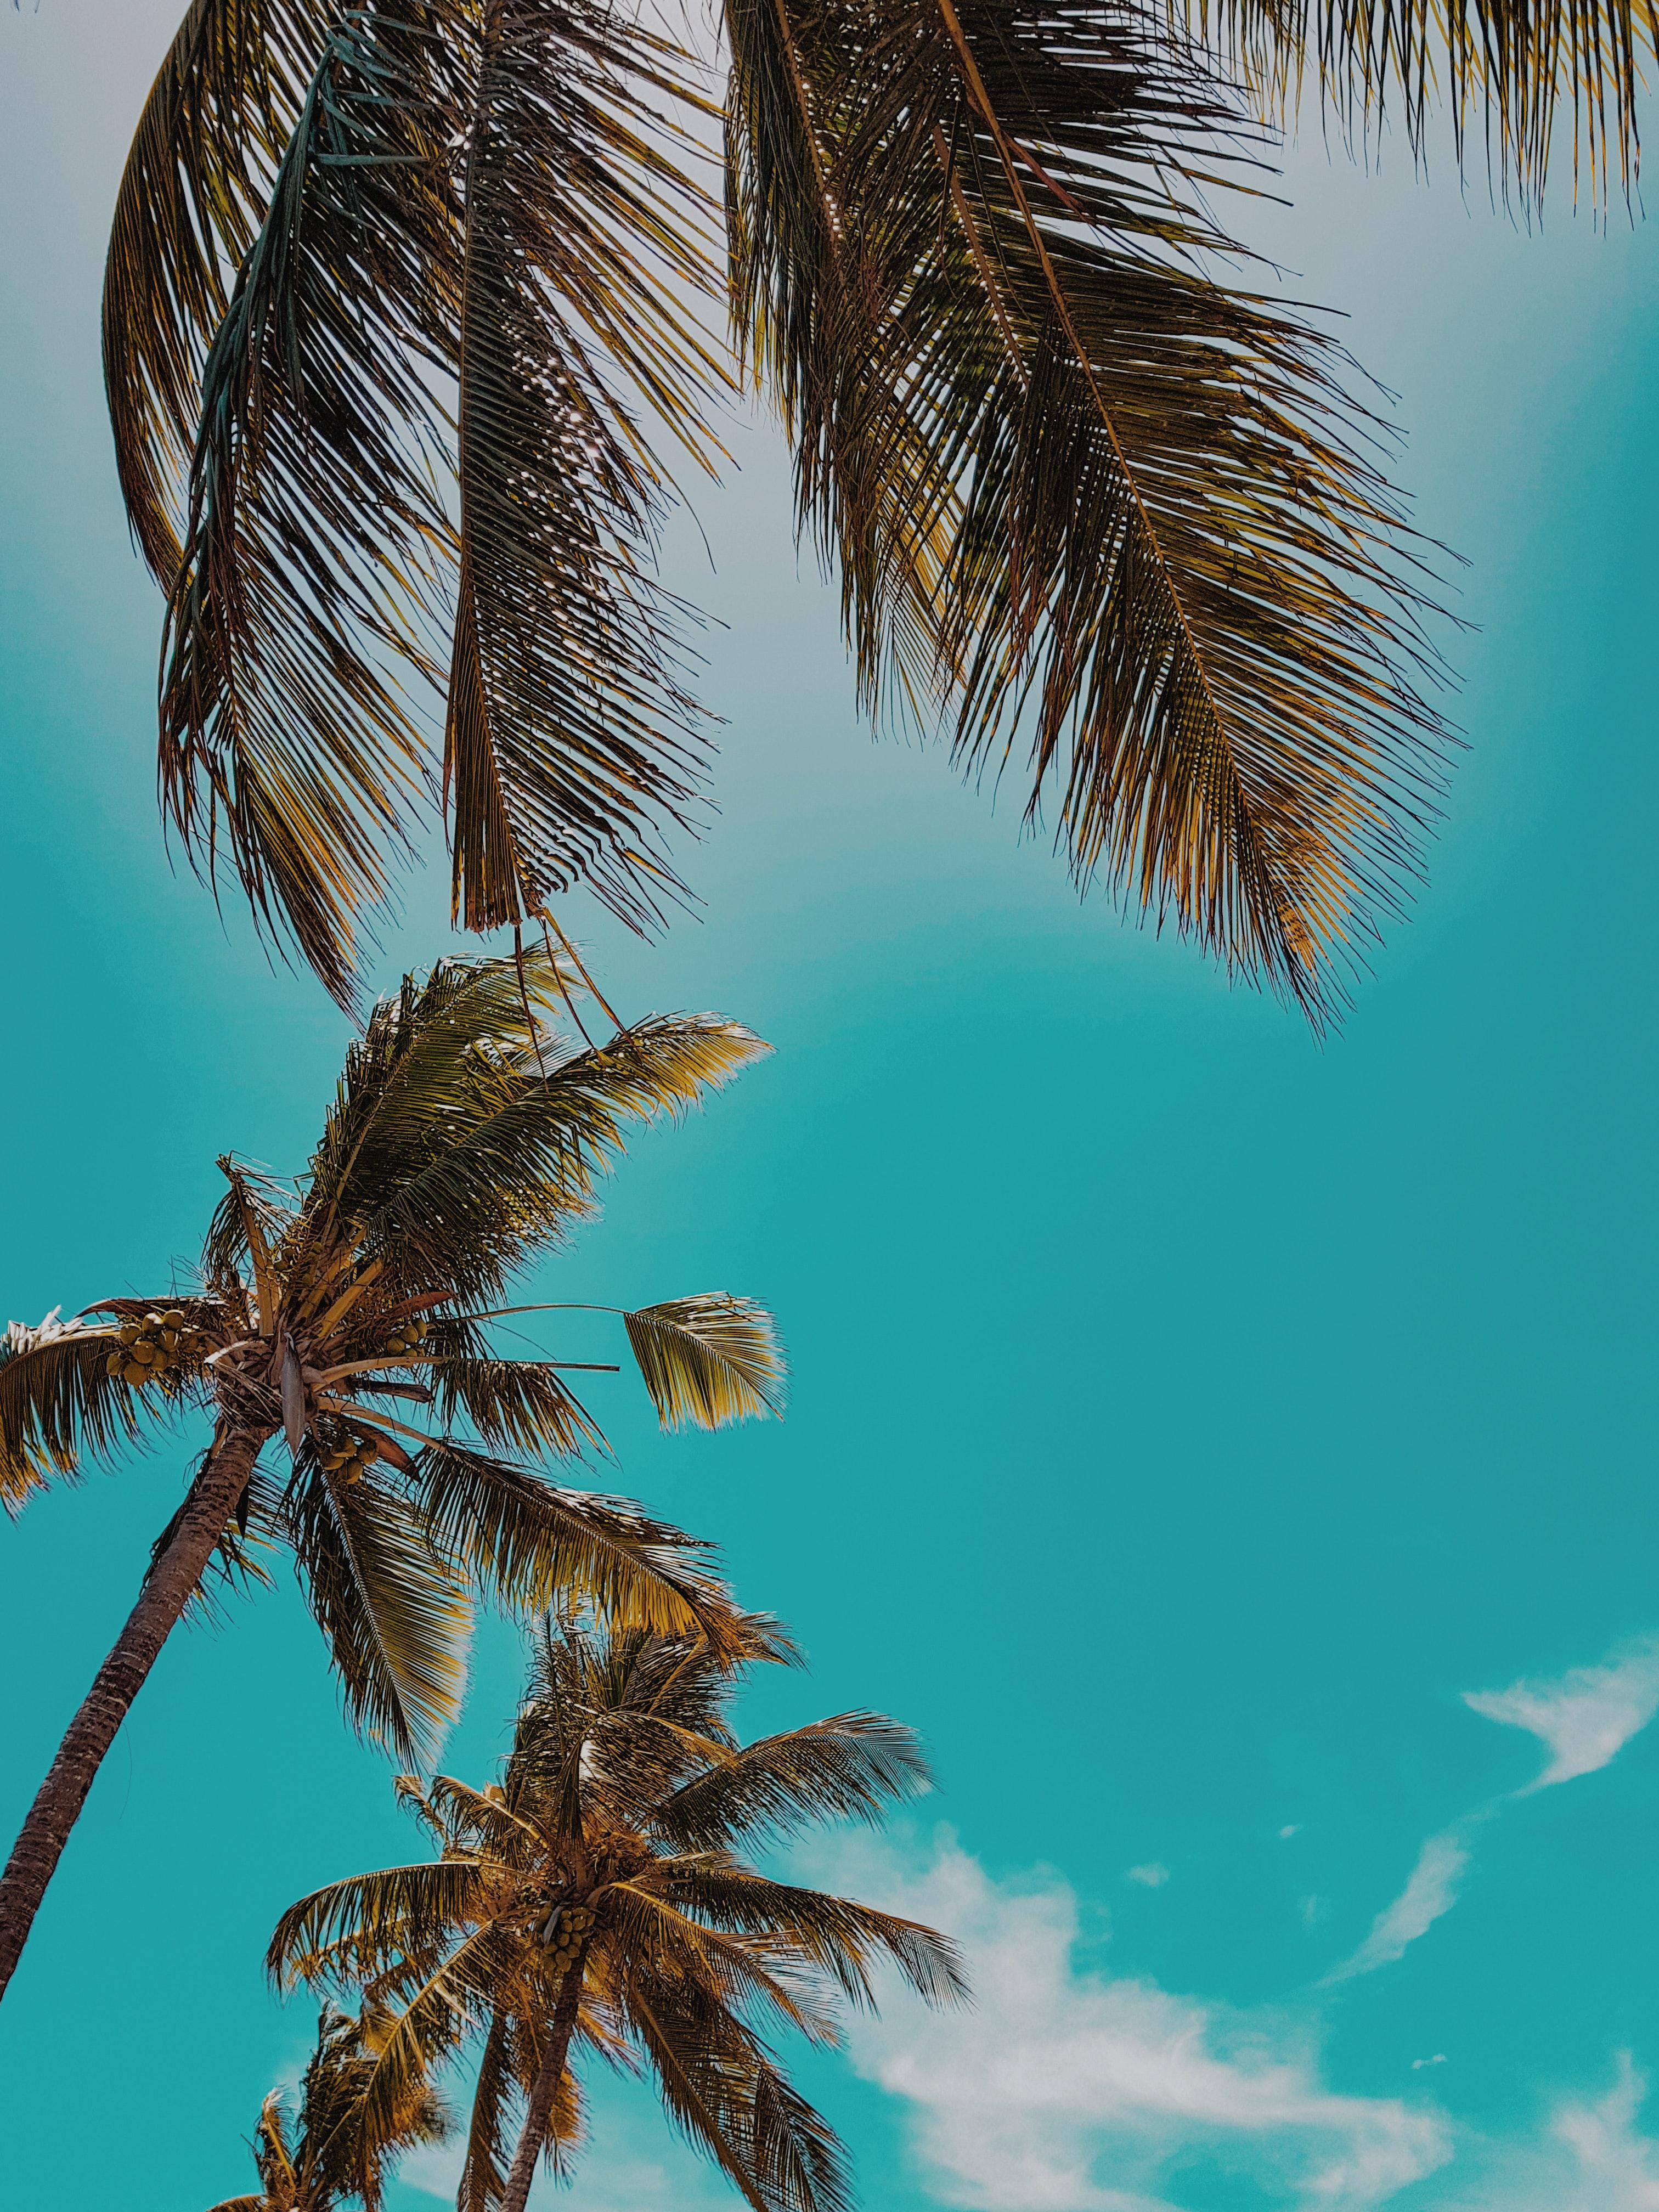 pexels photo 1869961.jpeg?cs=srgb&dl=alam bidikan sudut sempit cerah 1869961